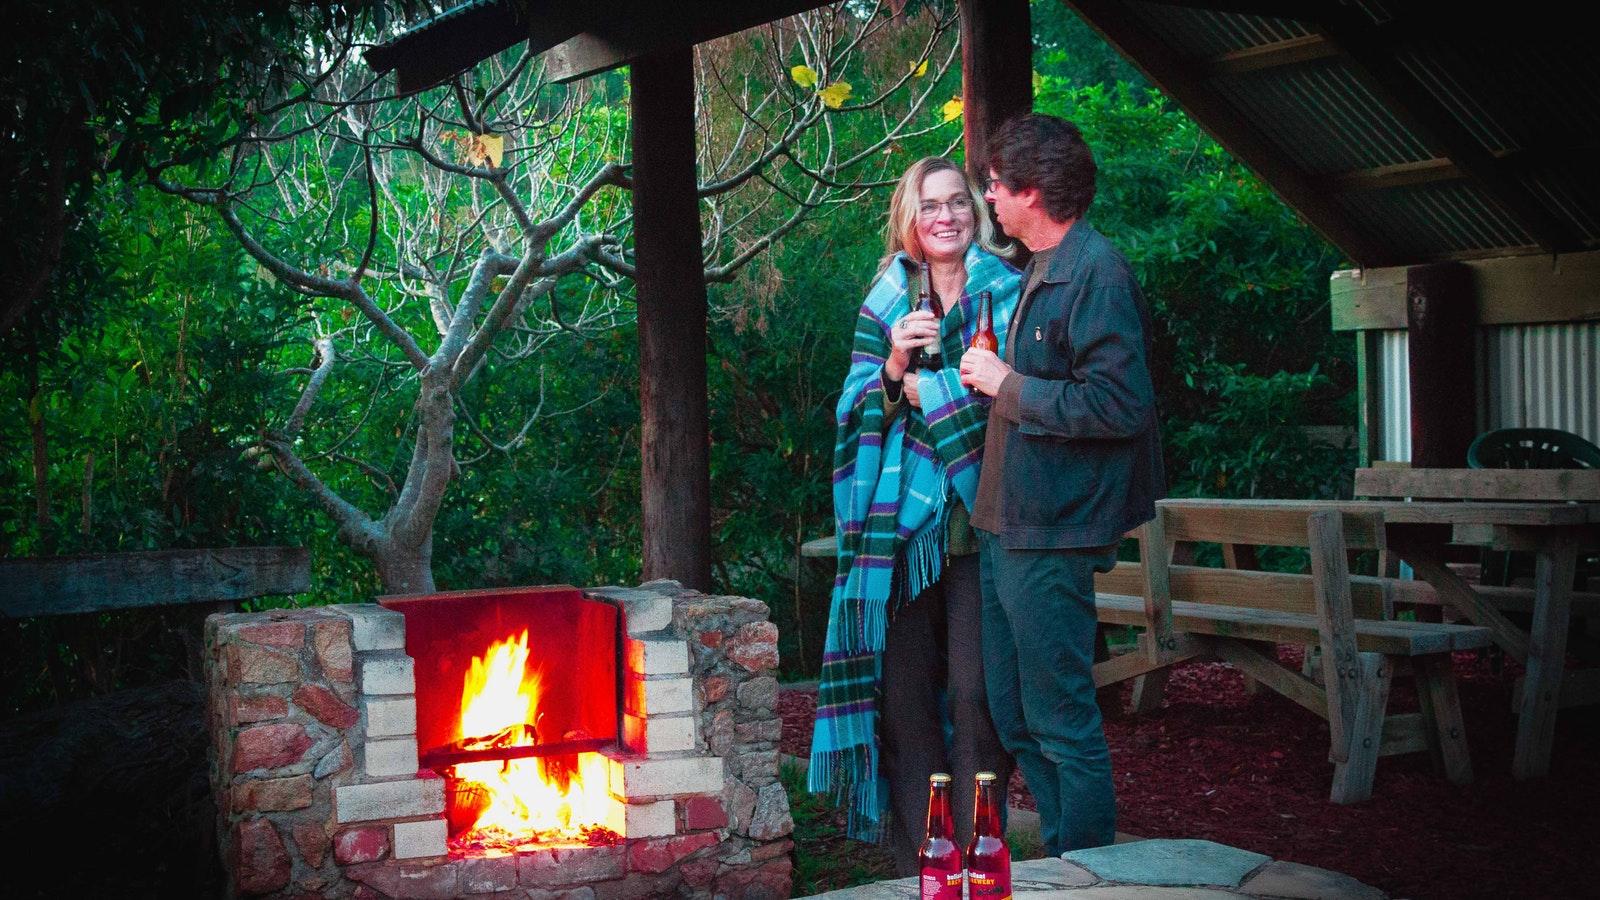 Enjoy a fireside story or a cuddle